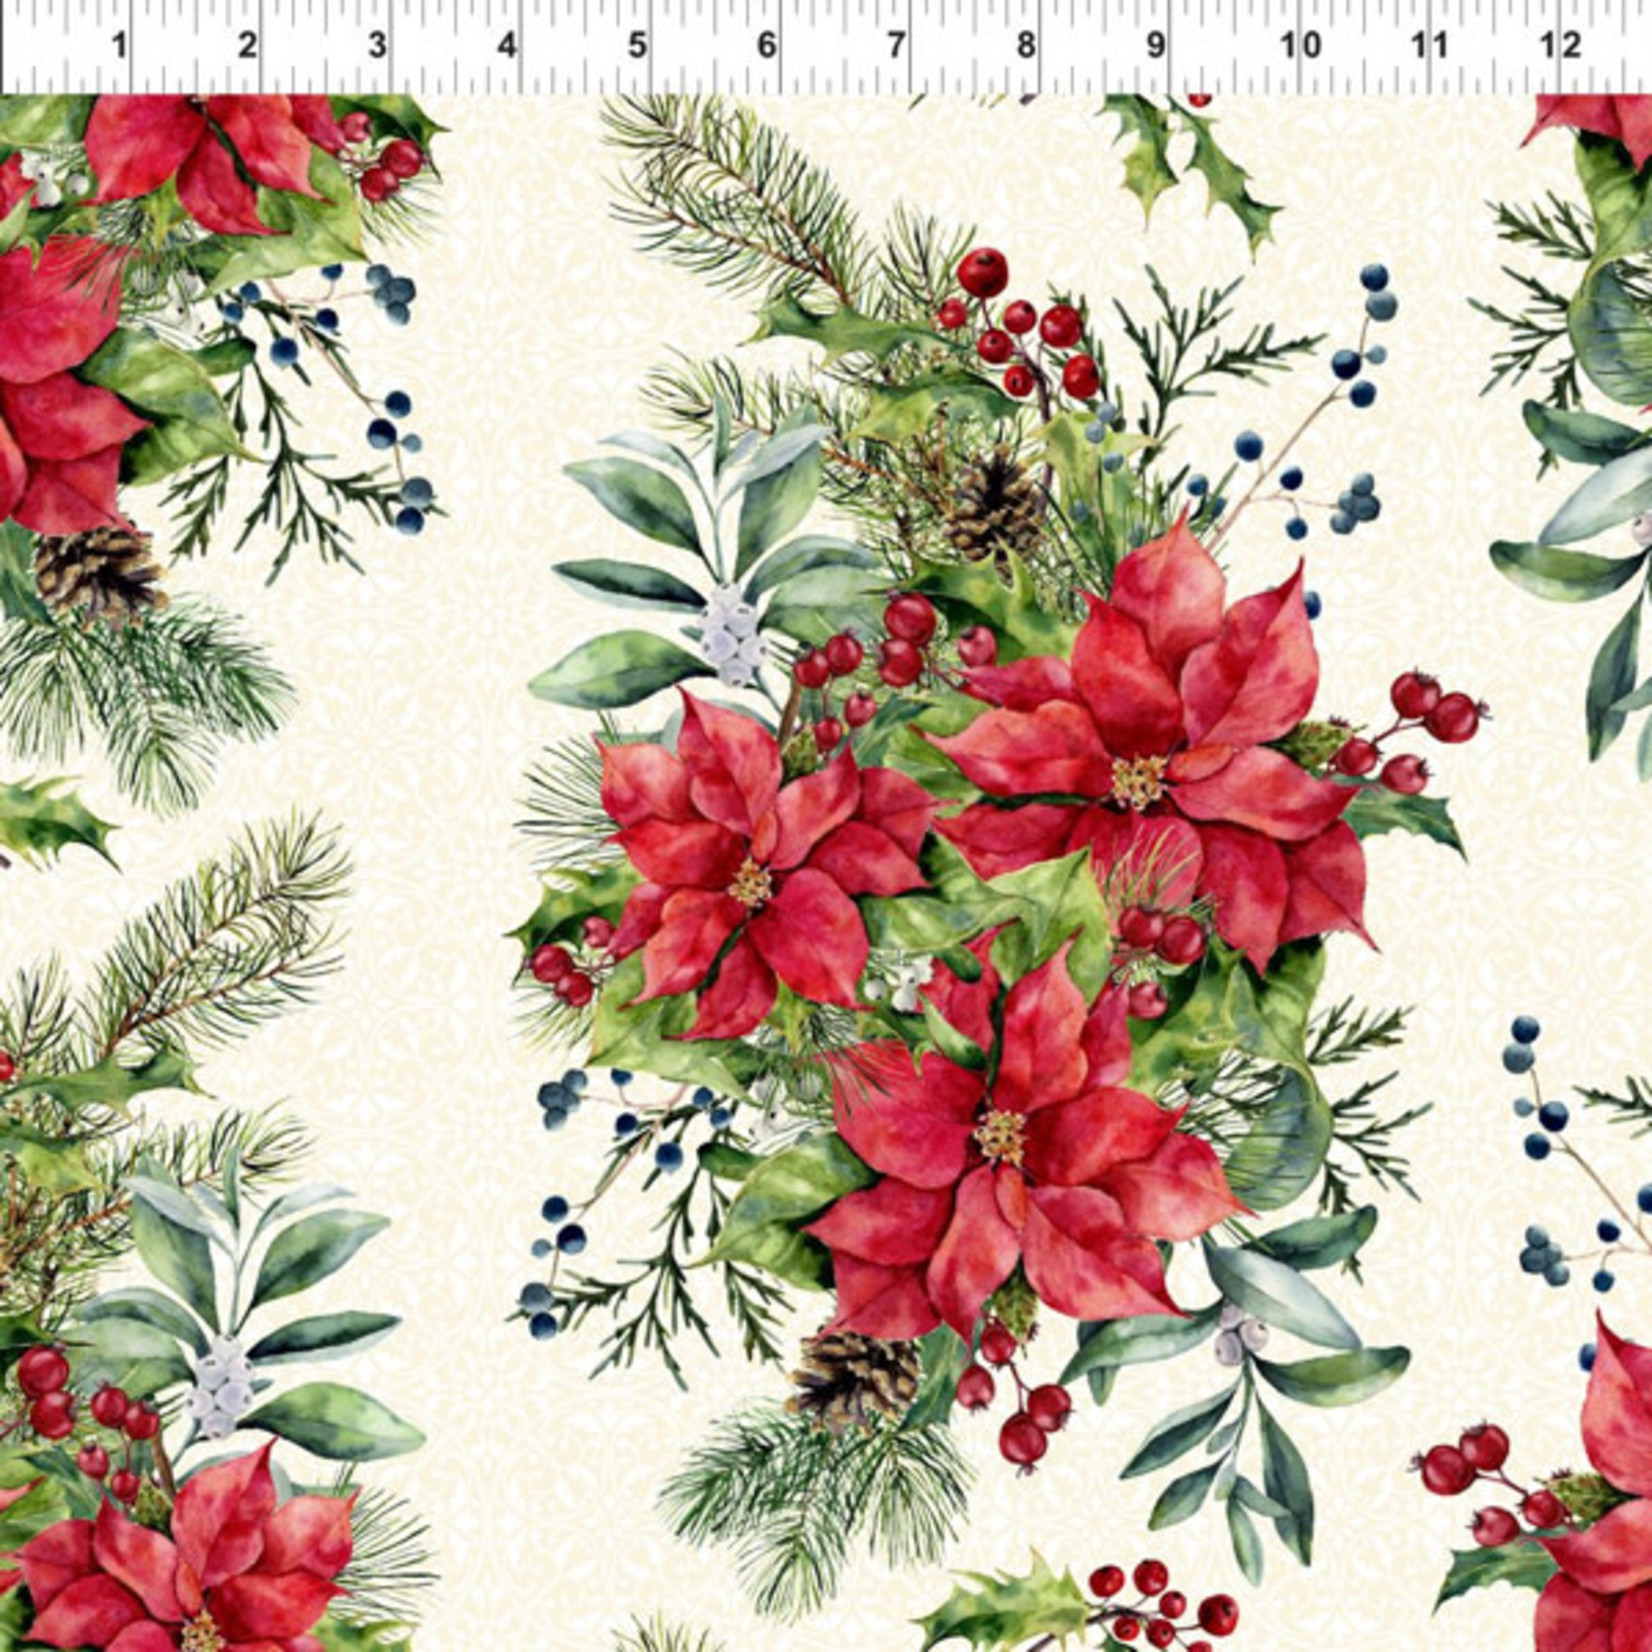 In the Beginning Fabrics A Poinsettia Winter - Bouquet on Cream